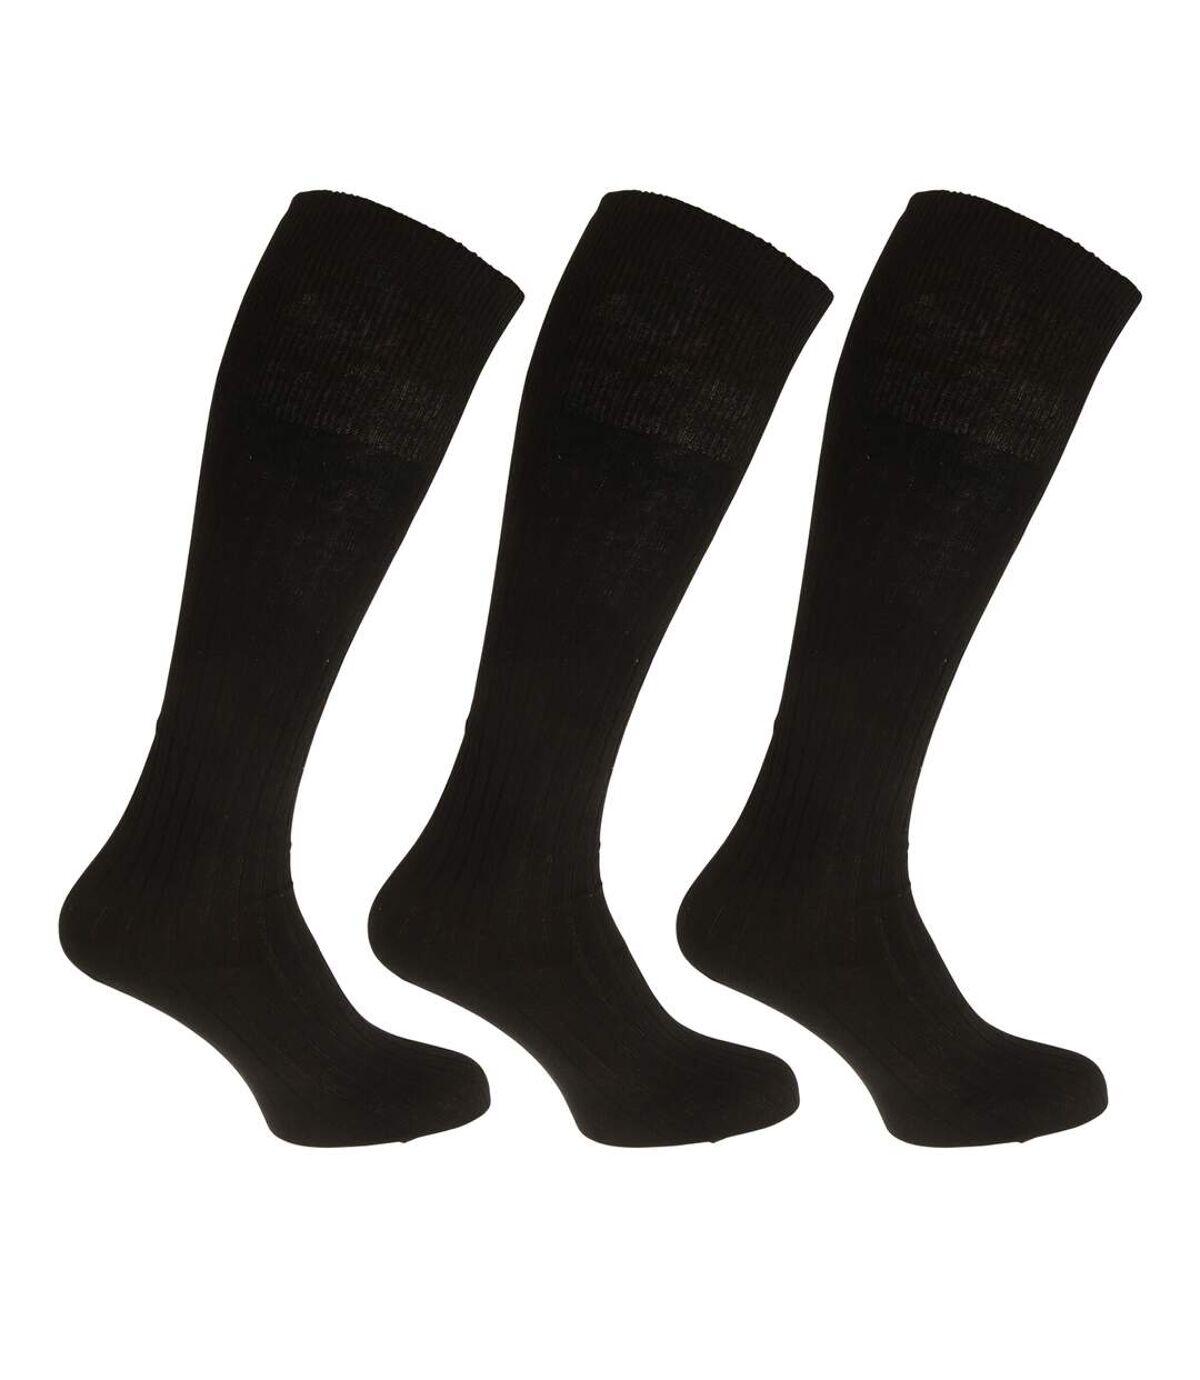 Mens Ribbed Knee High 100% Cotton Socks (Pack Of 3) (Black) - UTMB202